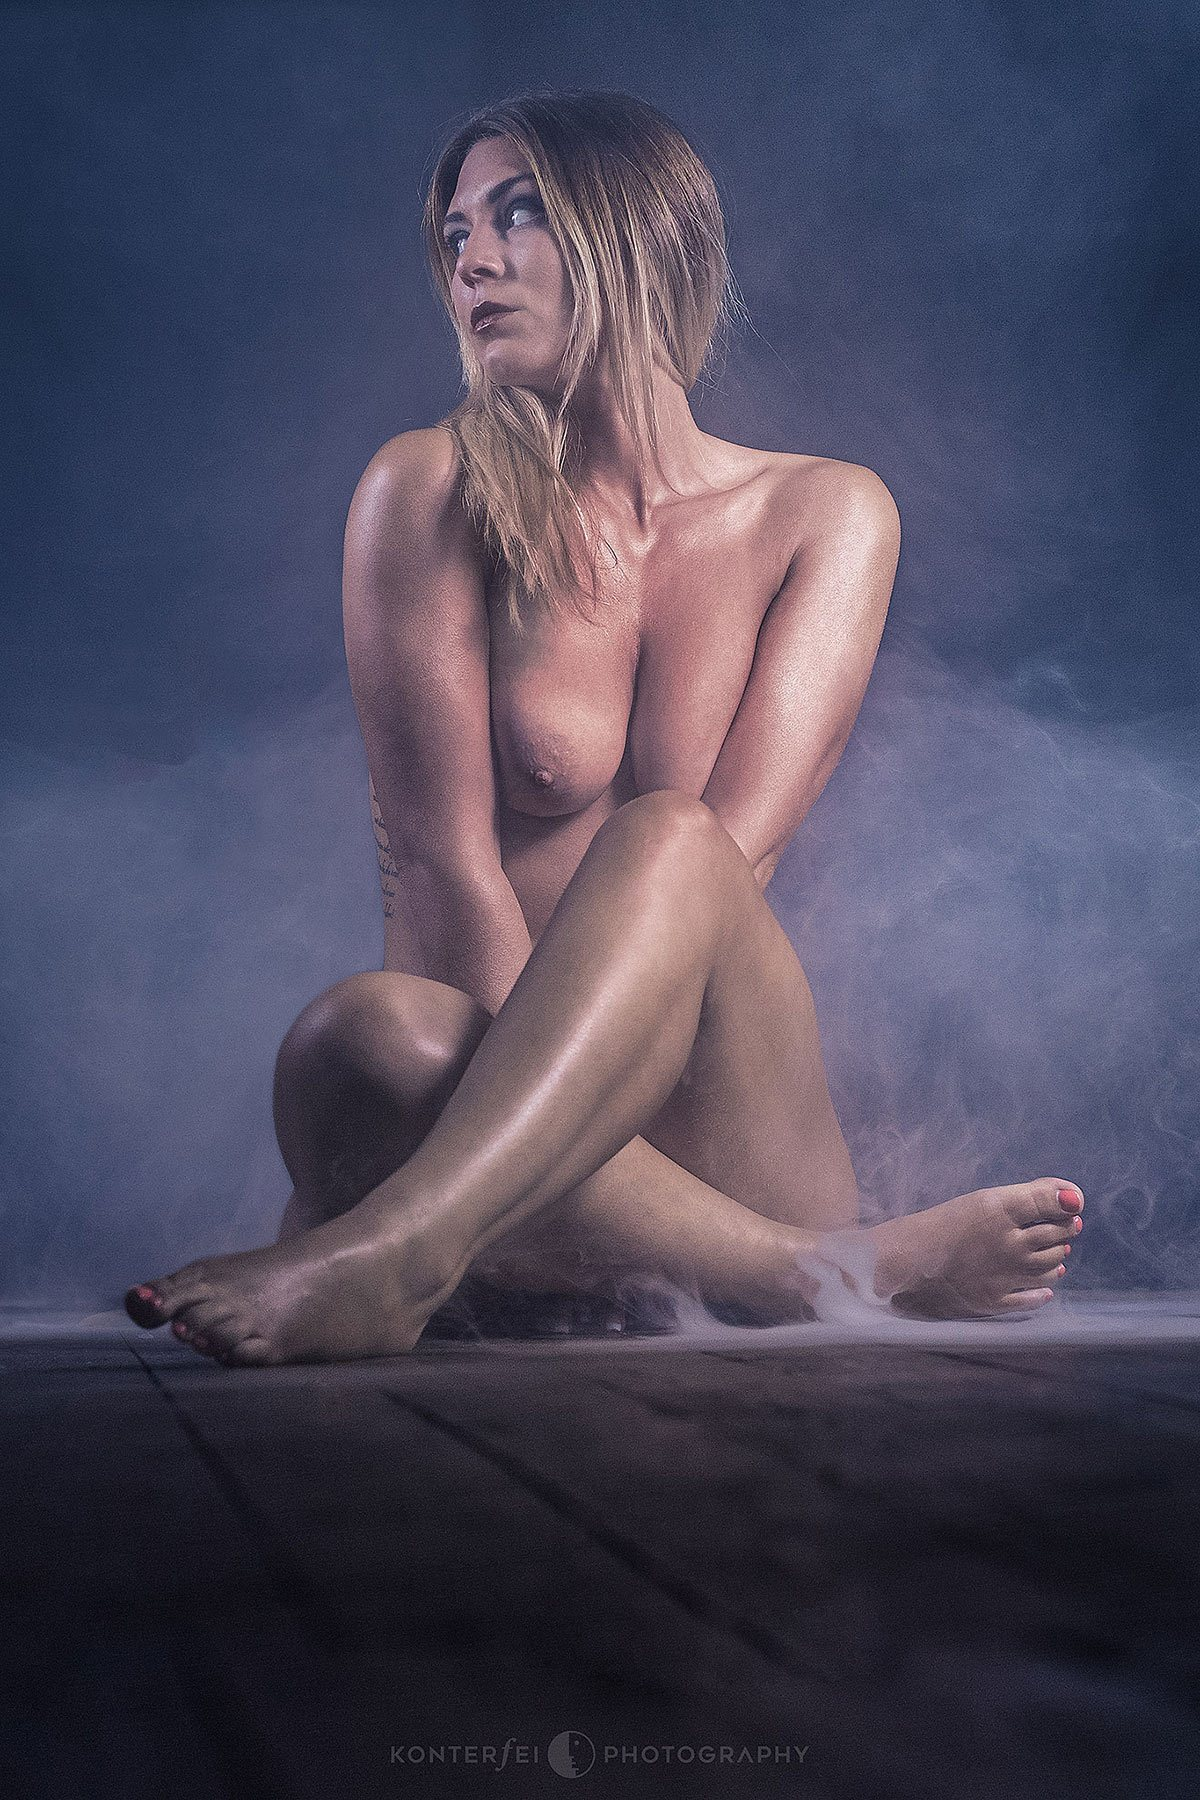 A Naked Girl on the Floor | Akt & Boudoir | Photography